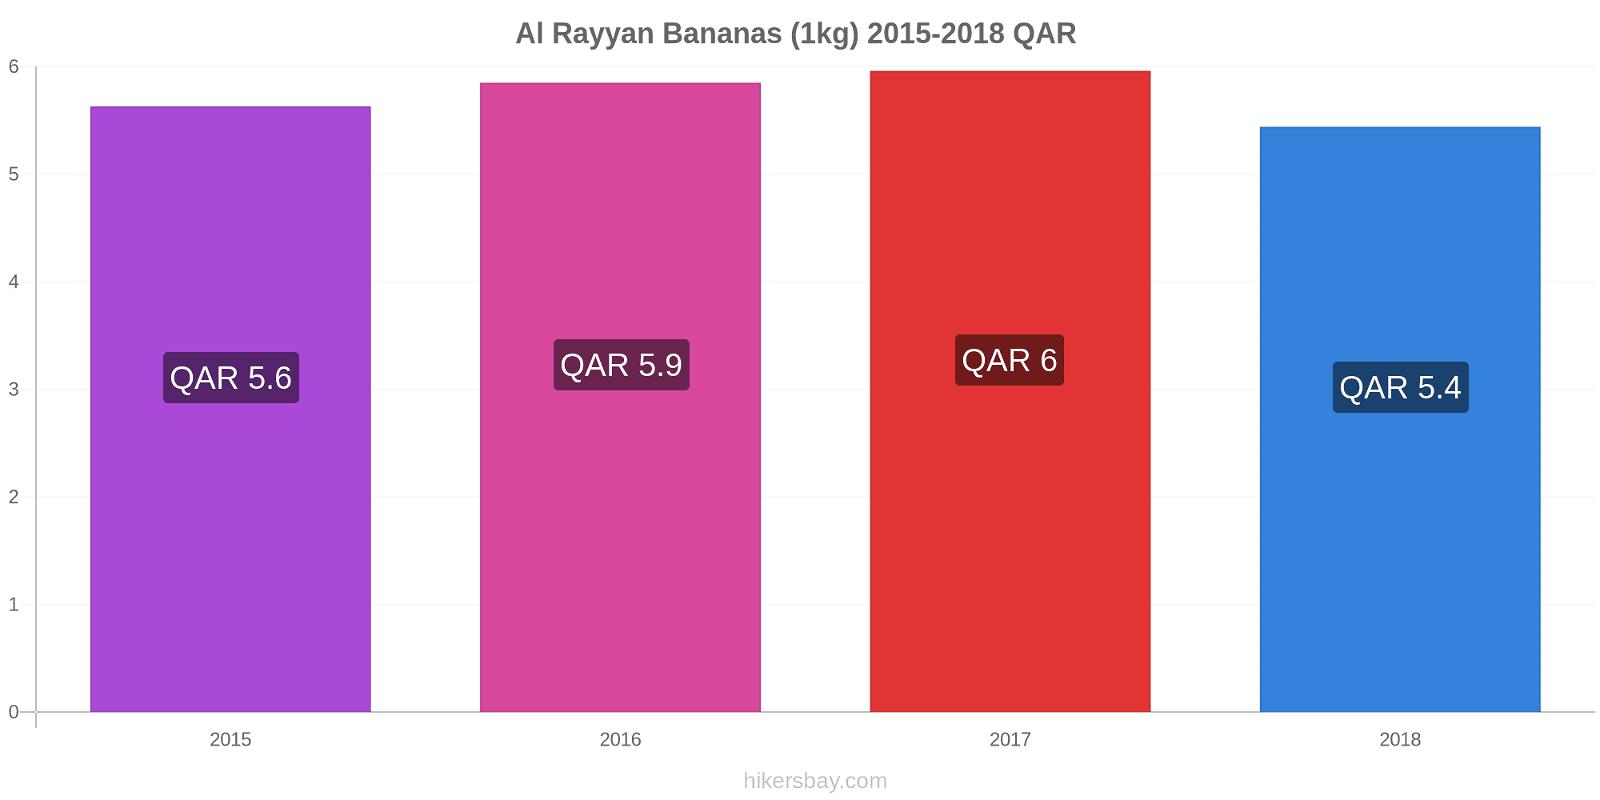 Al Rayyan price changes Bananas (1kg) hikersbay.com